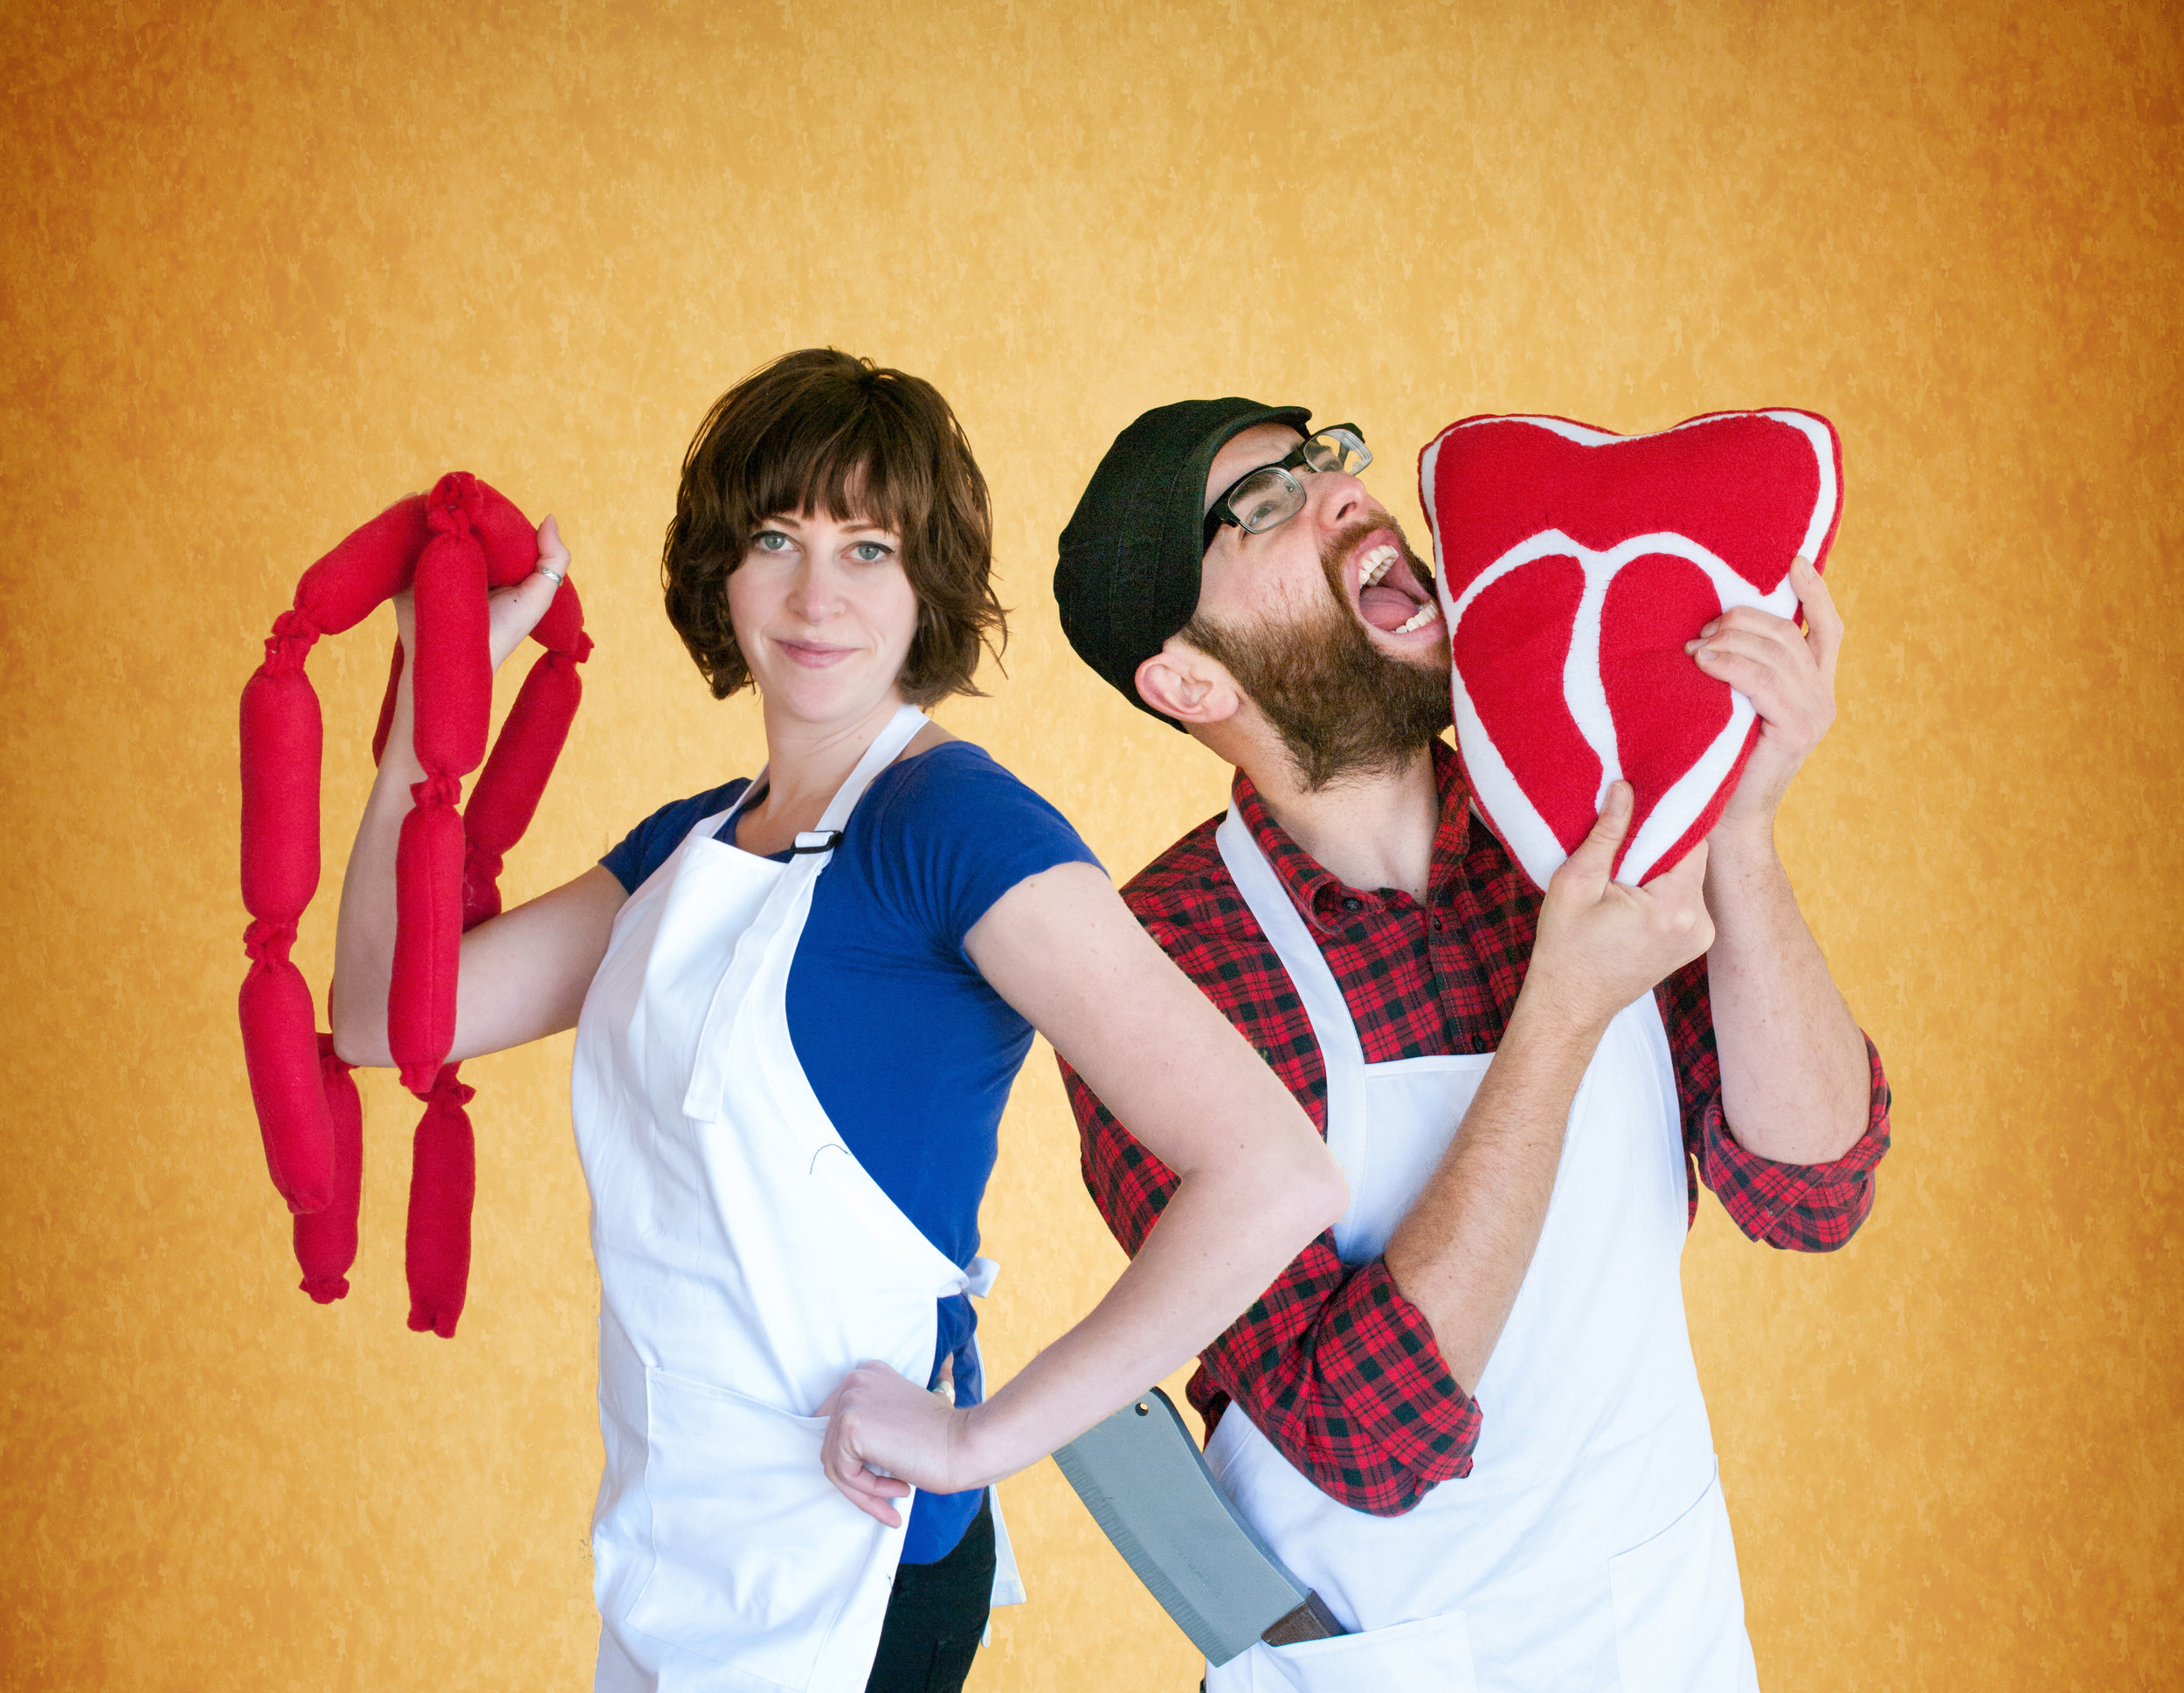 ▲  No Evil Foods  的创始人 Sadrah Schadel 和 Mike Woliansky(图片来源: No Evil Foods  官网)